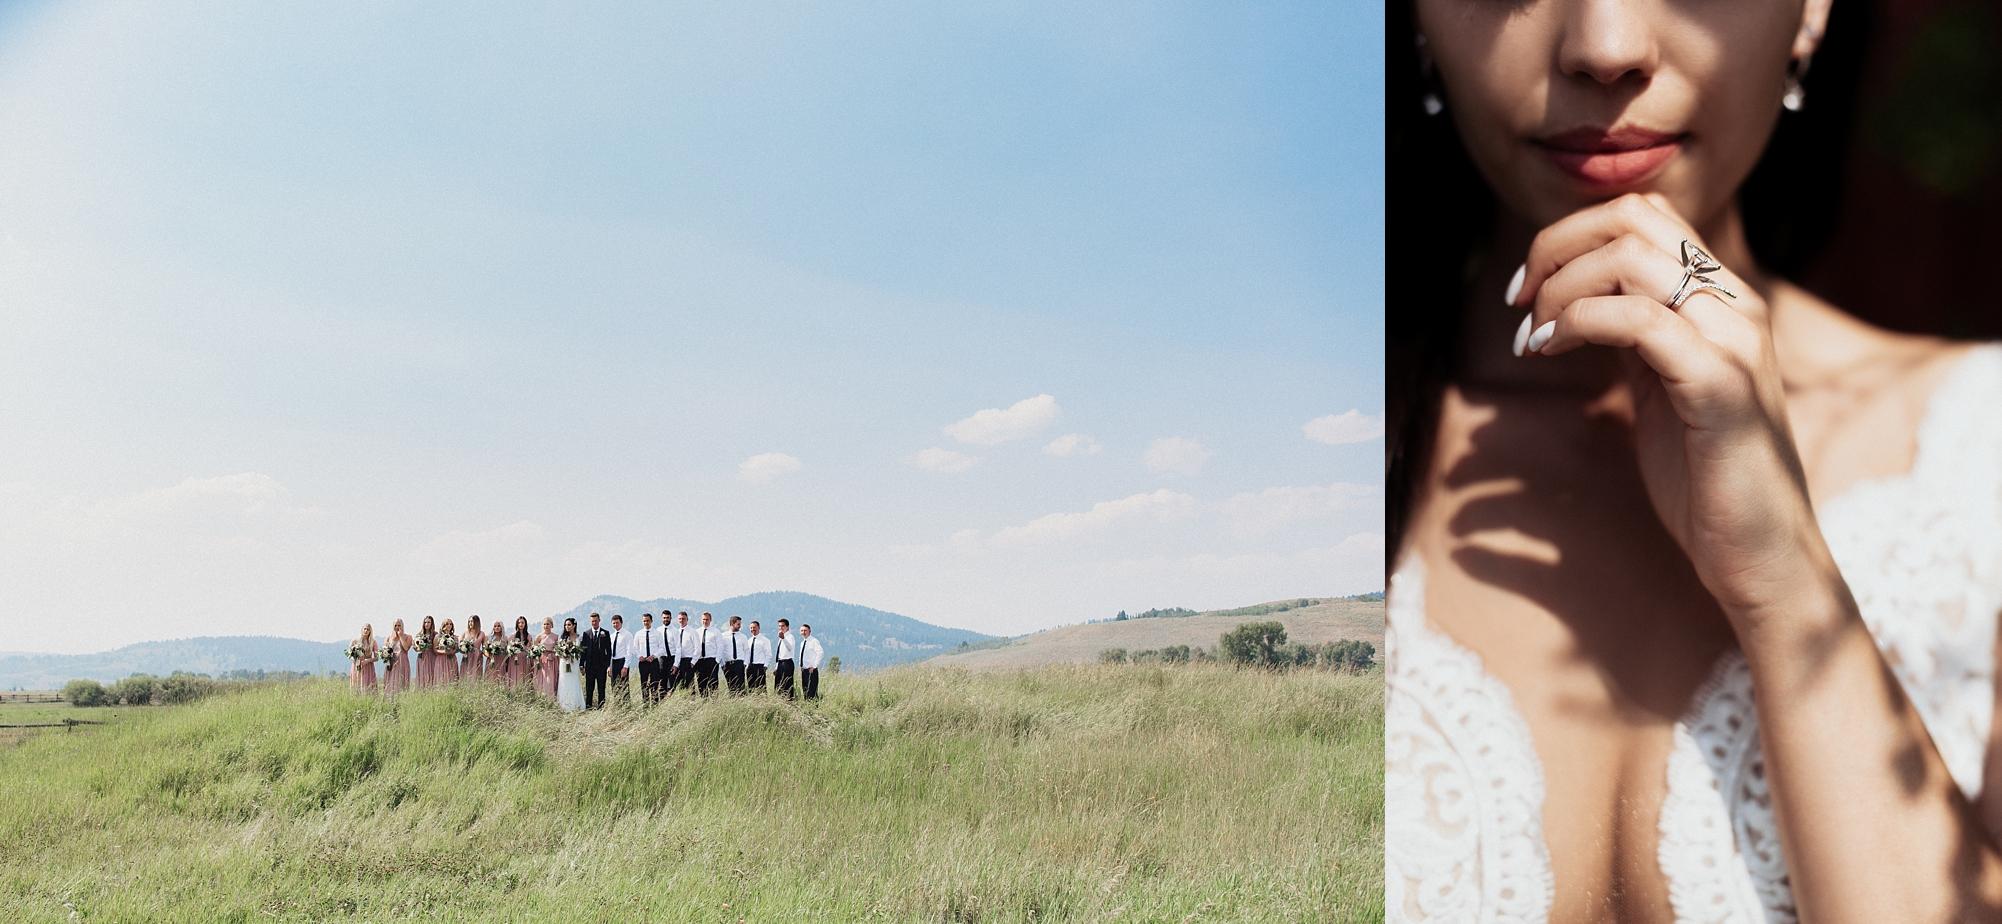 edenstraderphoto-weddingphotographer_1425.jpg